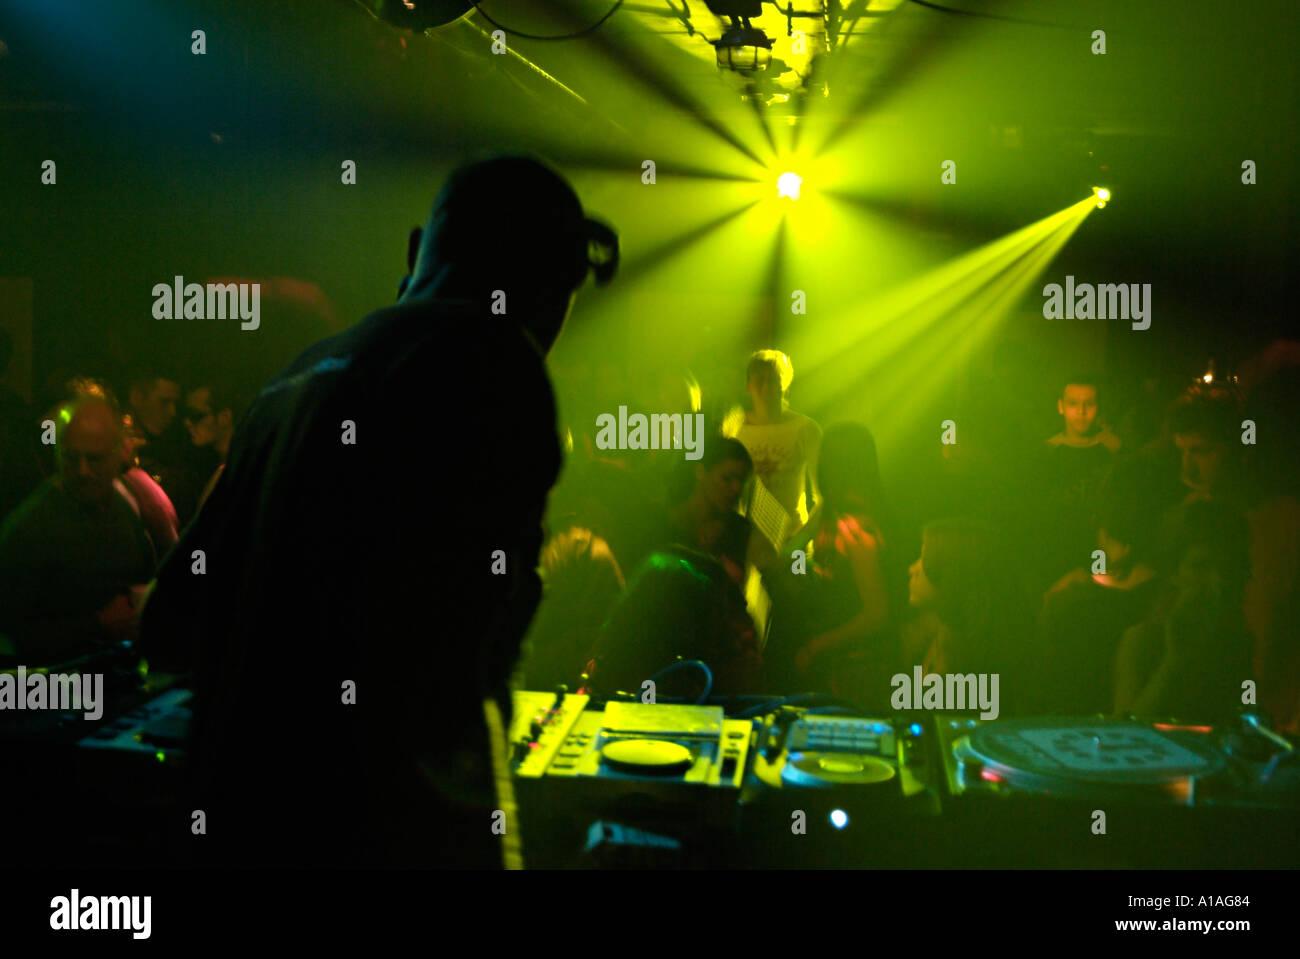 Club DJ dietro i ponti di un Nightclub affollato. Immagini Stock